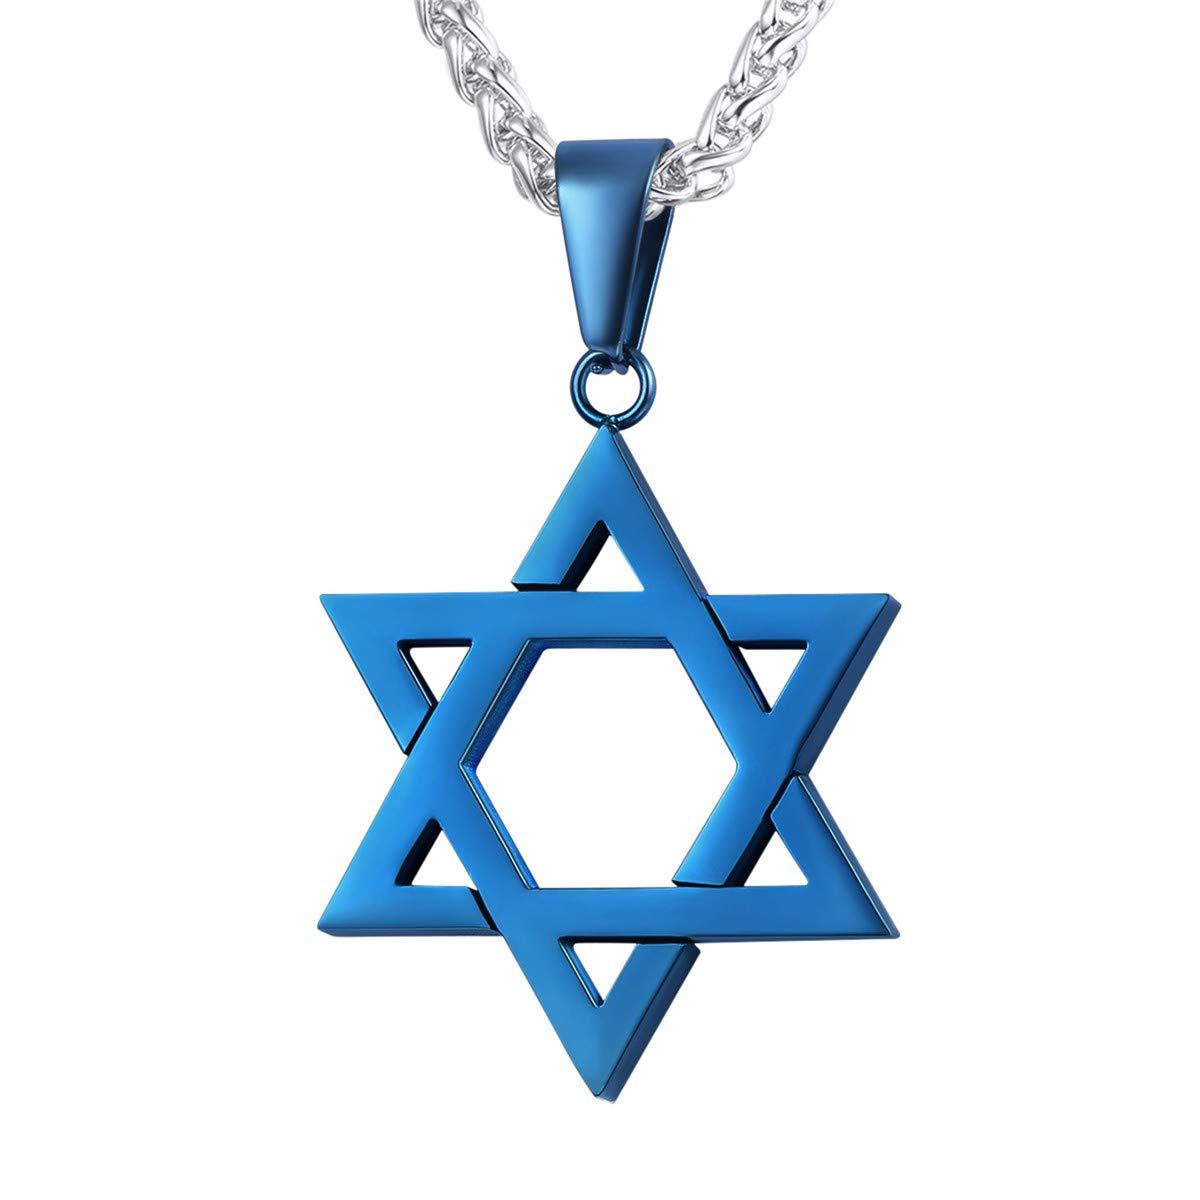 U7 Jewish Jewelry Star of David Pendant Necklace Women Men Chain Black Gun Plated/18K Gold Plated/Stainless Steel Israel Necklaces U7 Jewelry U7 GP1813H